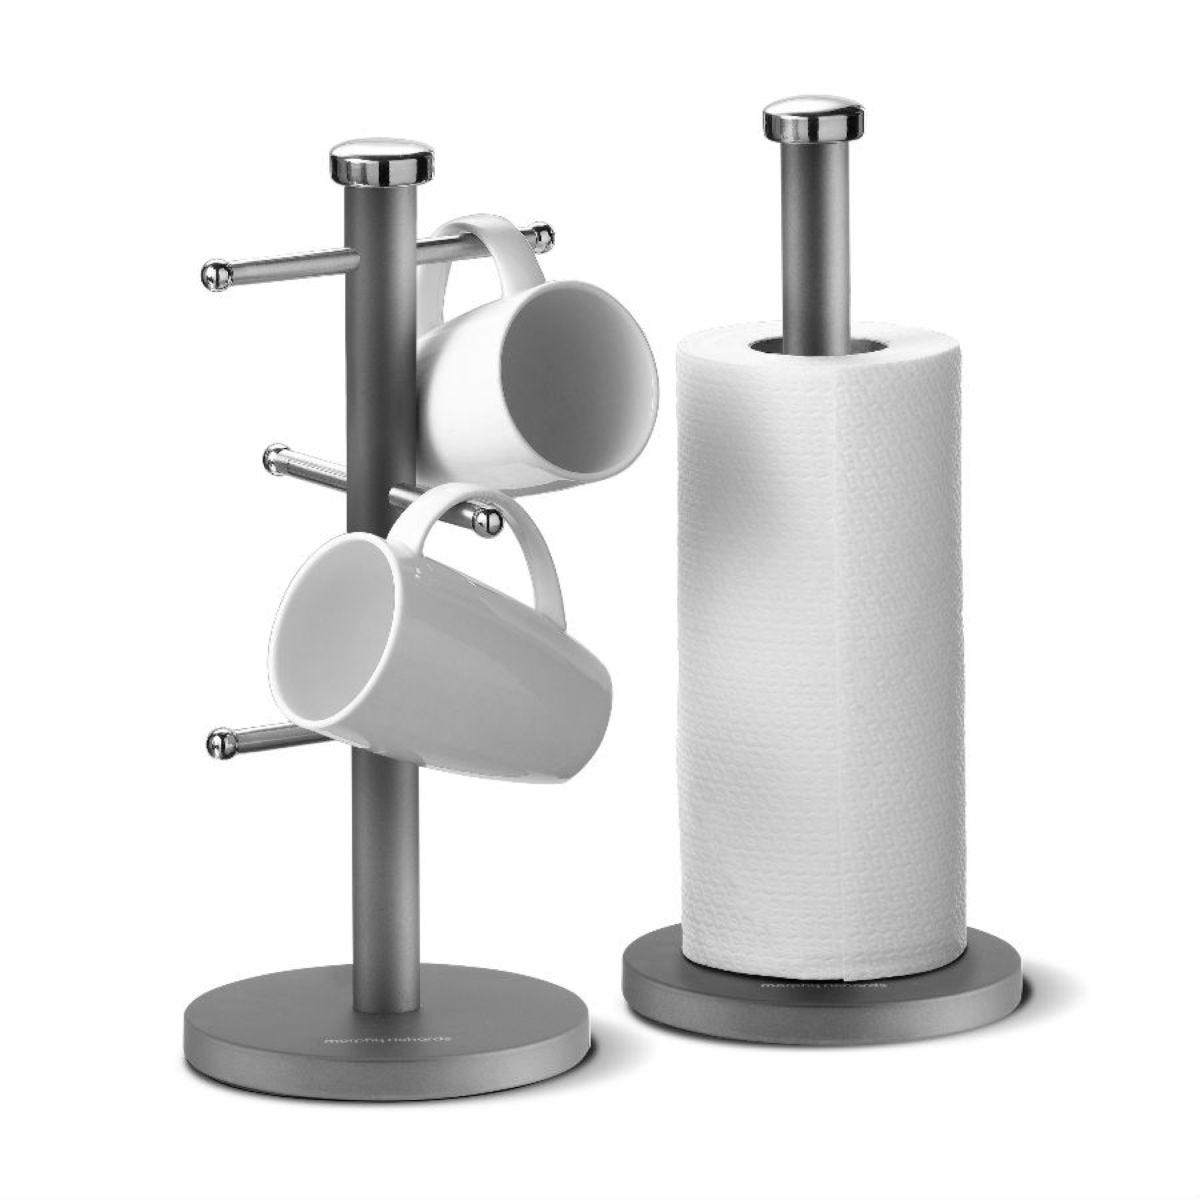 Morphy Richards Accents Mug Tree and Kitchen Roll Holder - Titanium